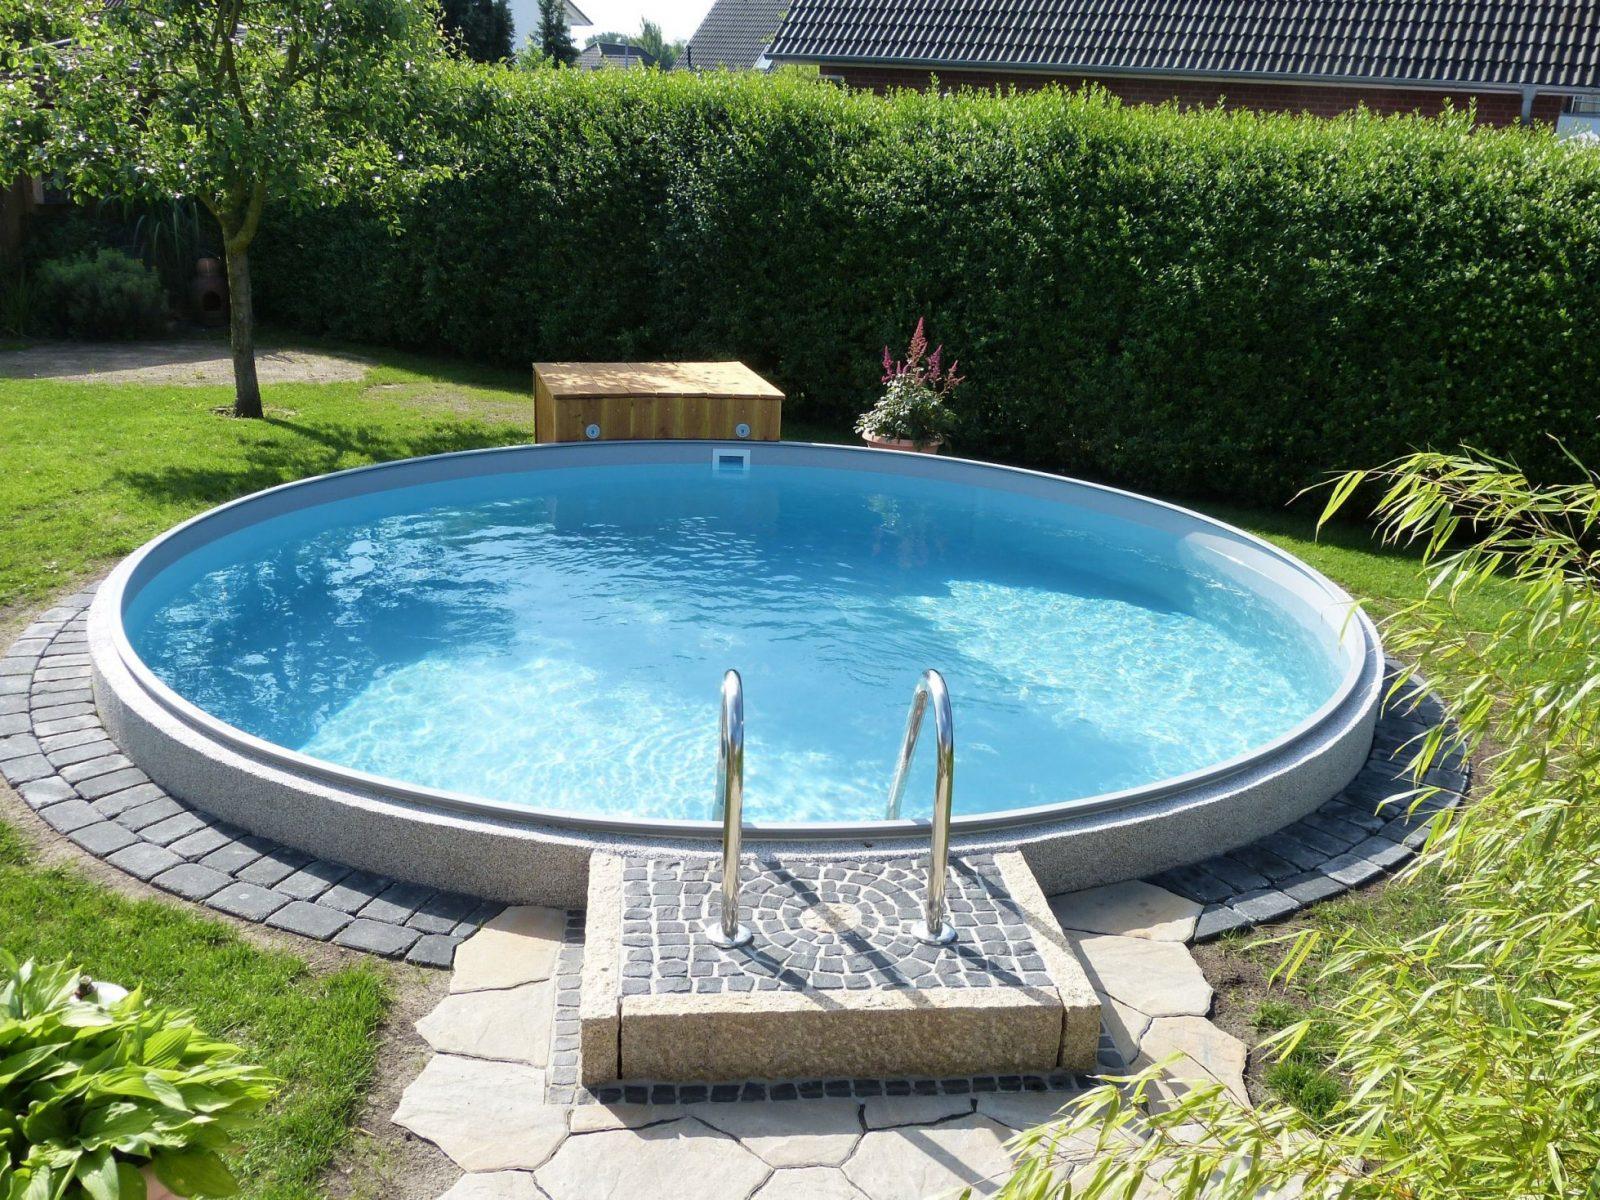 Pool Selber Bauen Anleitung Perfekt Pool Selber Bauen Paletten von Pool Aus Paletten Selber Bauen Photo